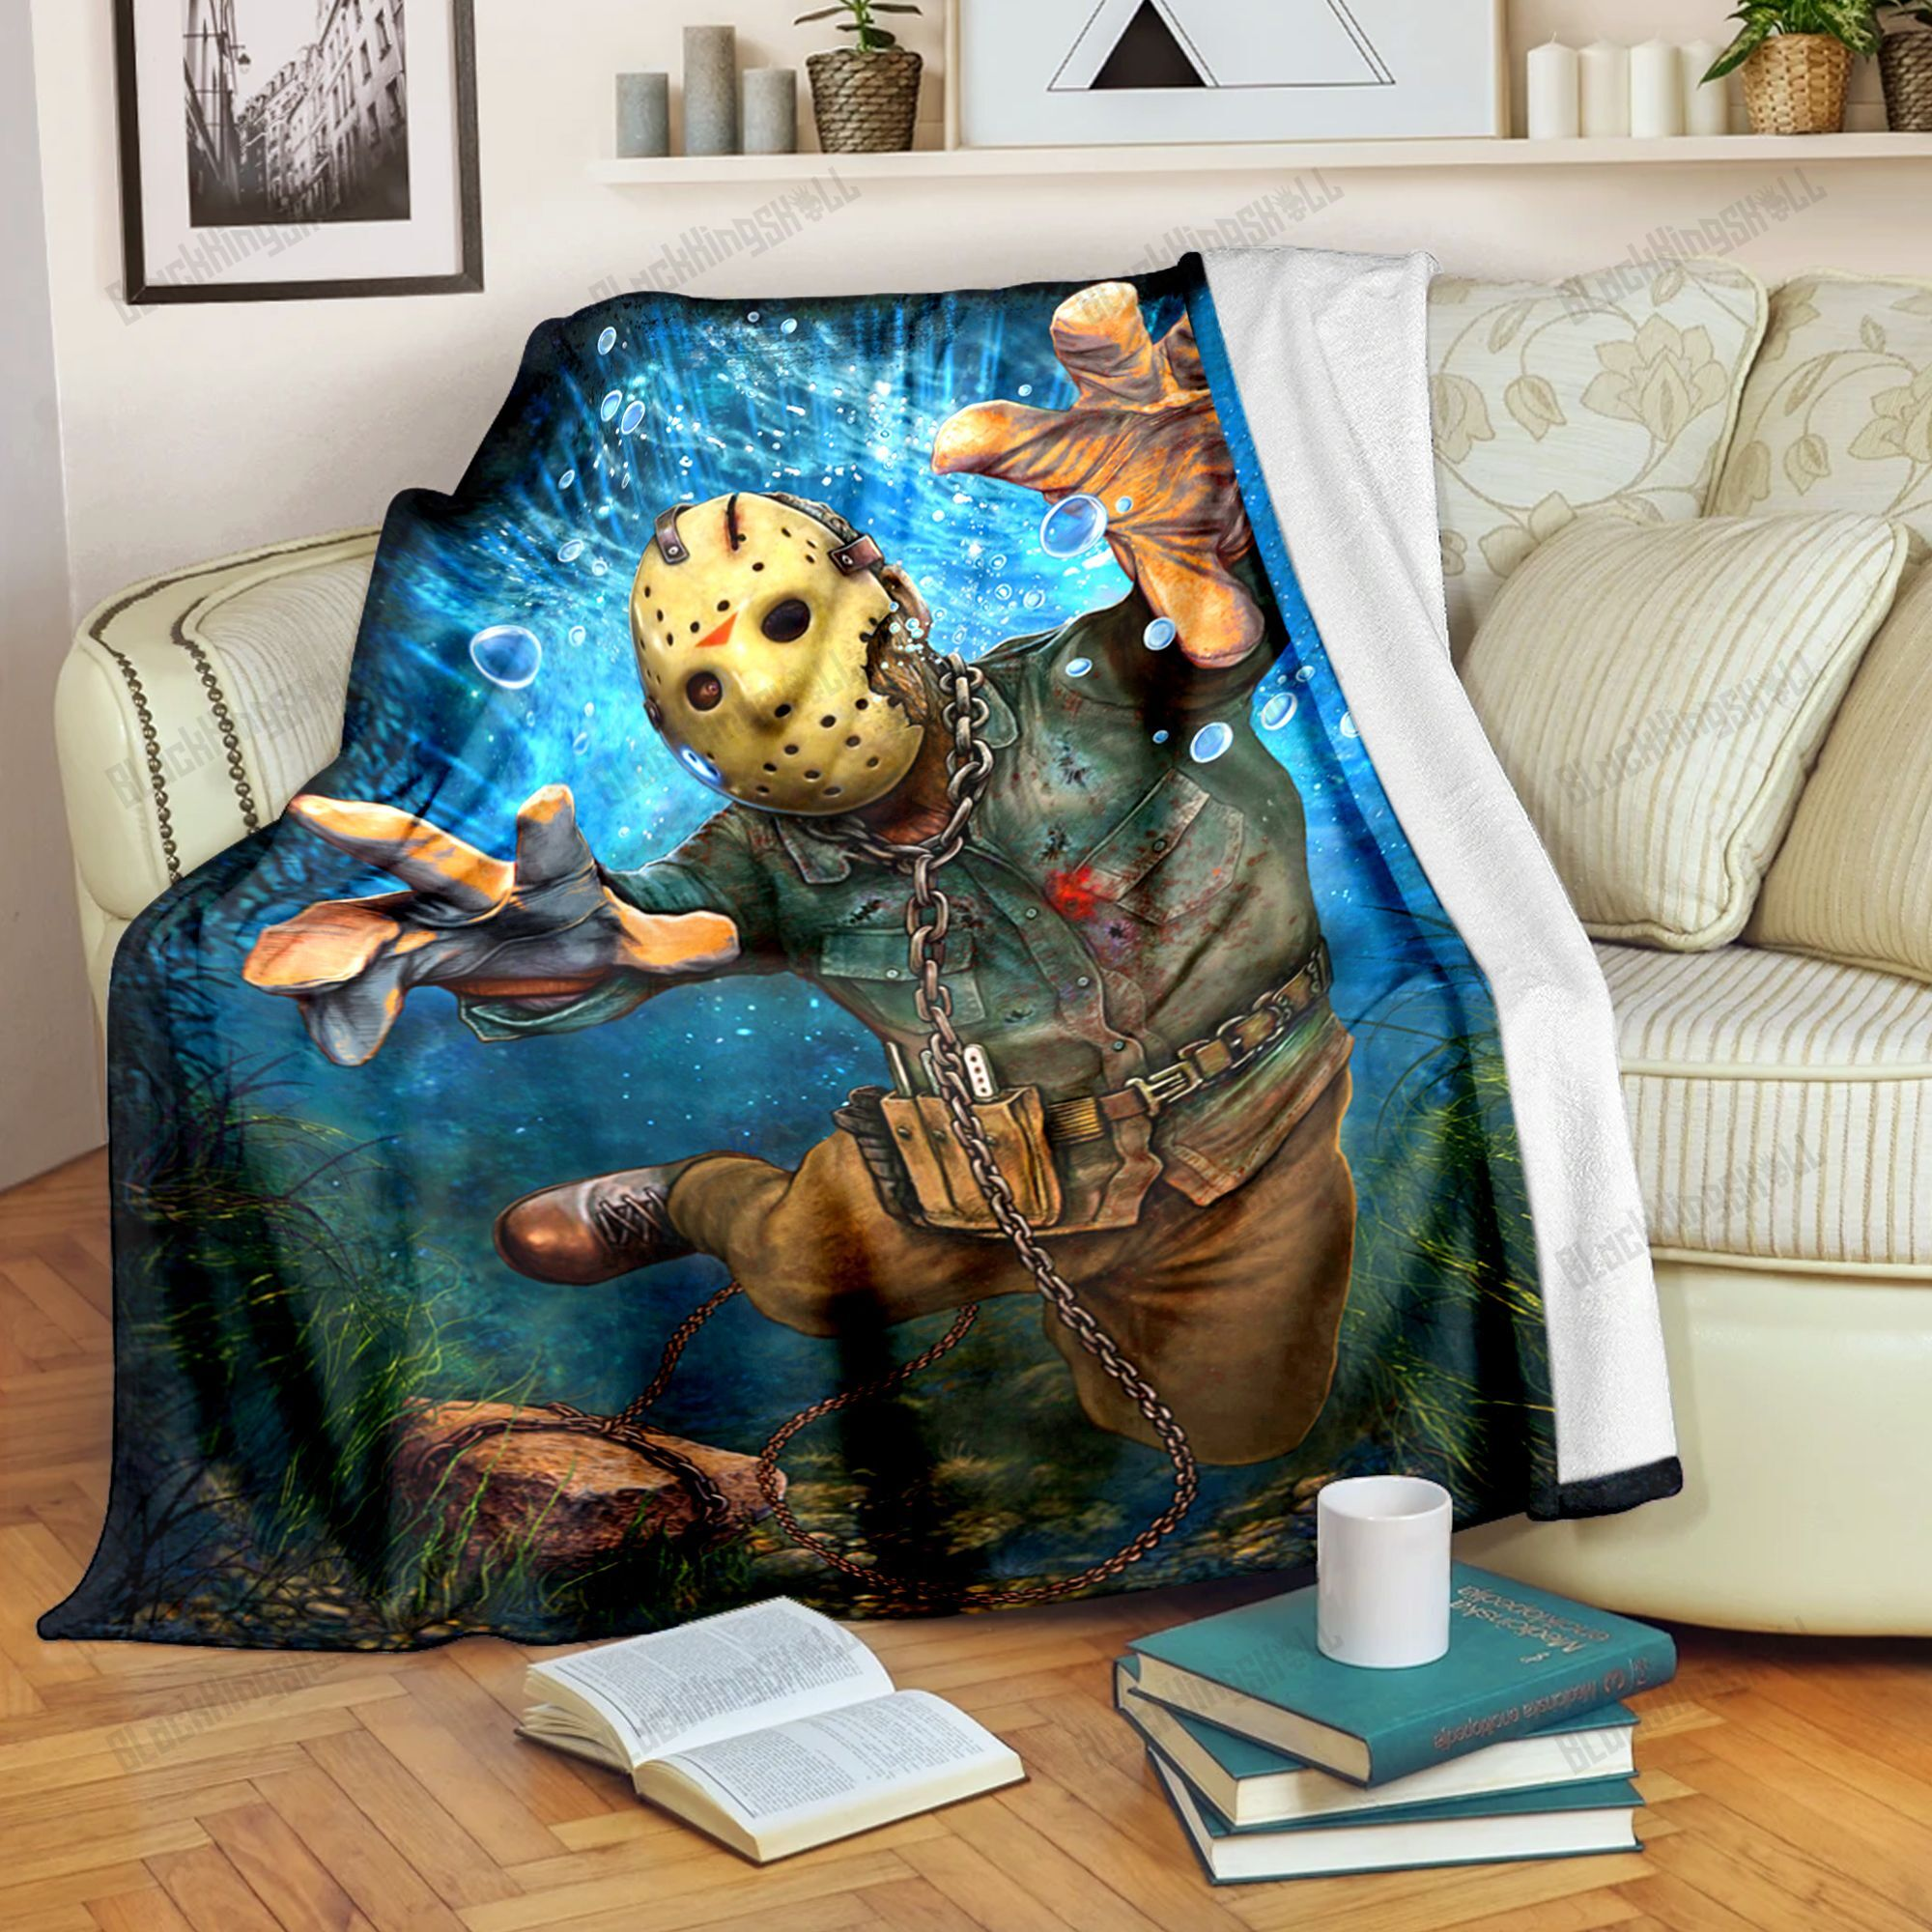 Jason Voorhees Friday the 13th Fleece Blanket